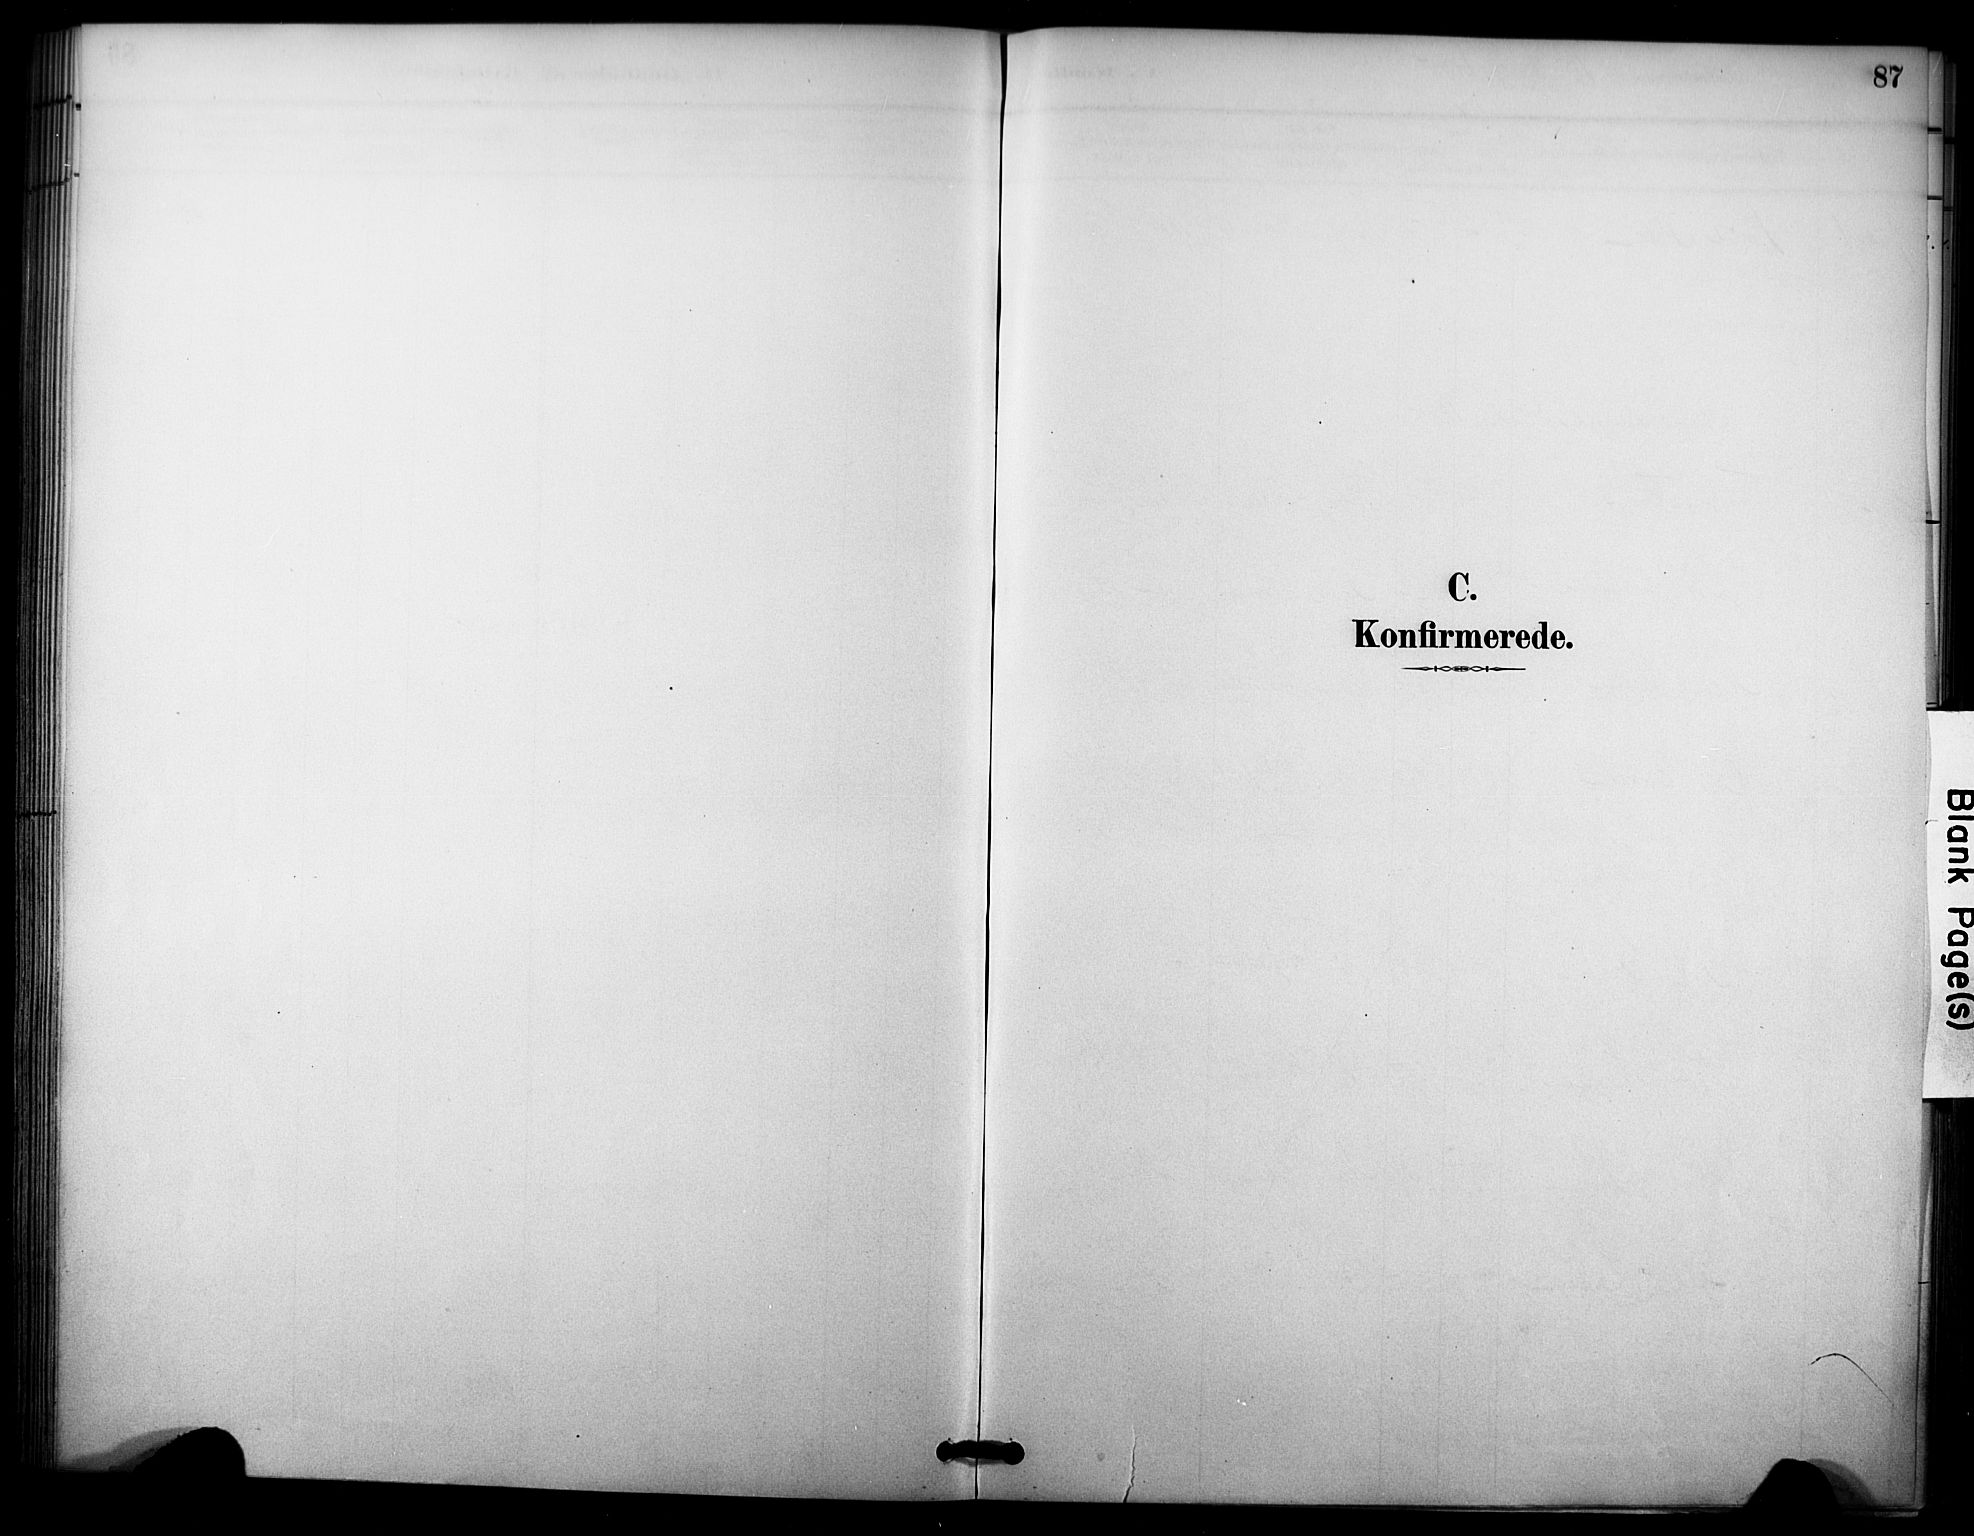 SAKO, Nore kirkebøker, F/Fc/L0004: Ministerialbok nr. III 4, 1885-1898, s. 87